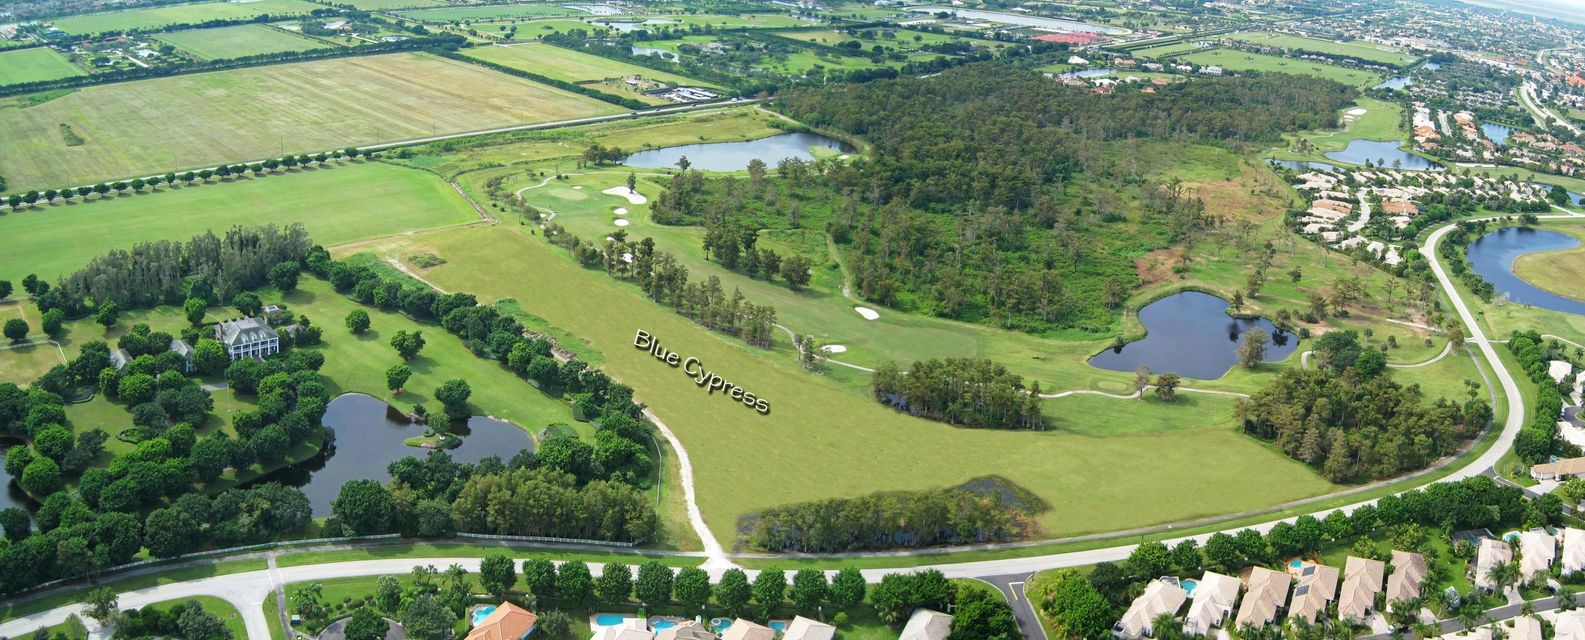 Single Family Home for Sale at 3208 Blue Cypress Lane 3208 Blue Cypress Lane Wellington, Florida 33414 United States